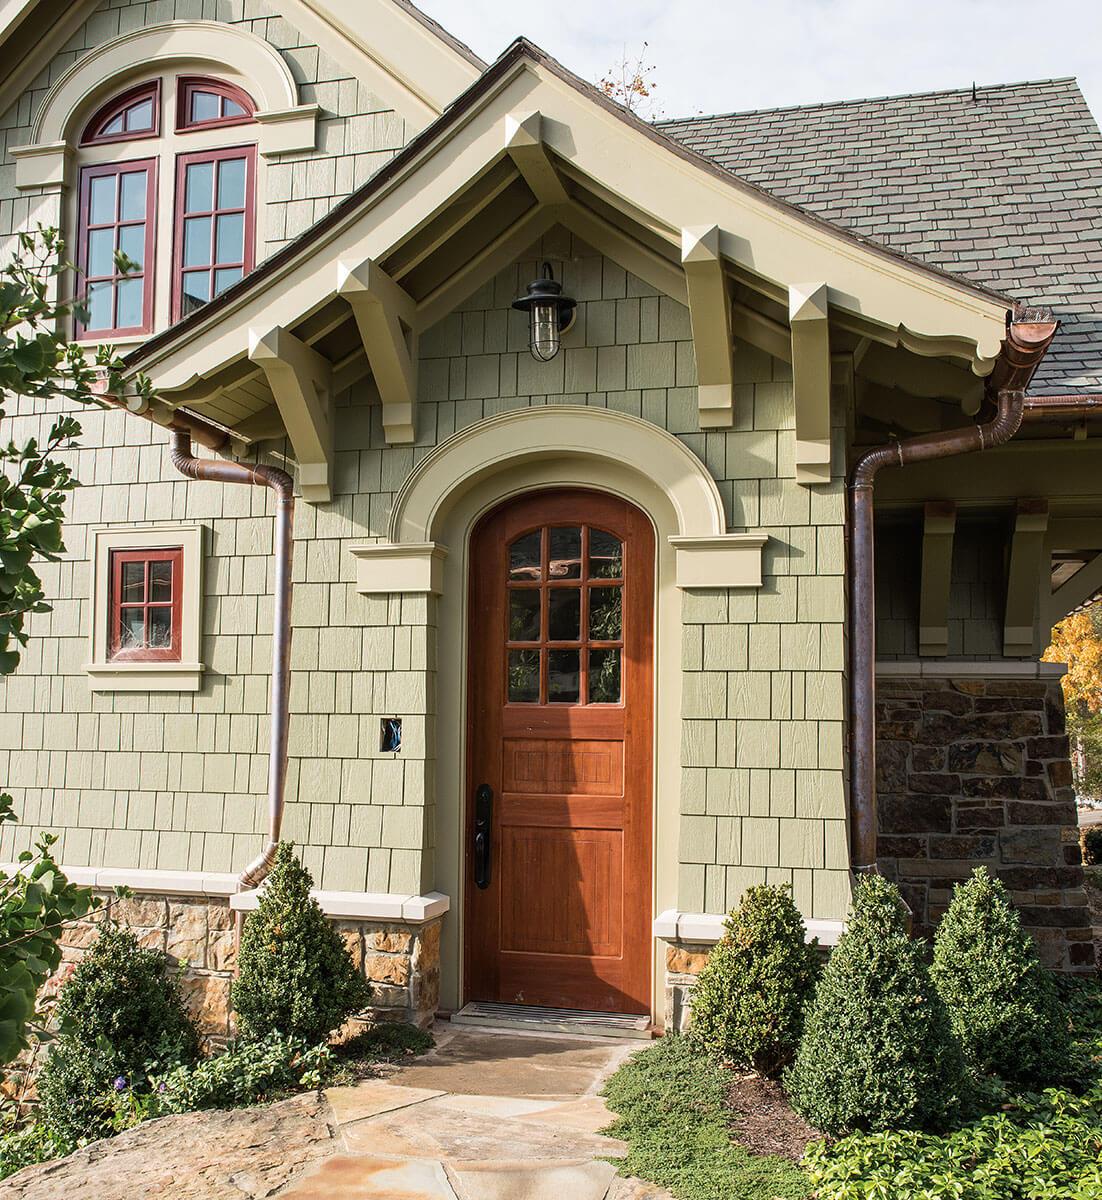 ... Neuenschwander Spanish Cedar Elliptical Arch Exterior Door ...